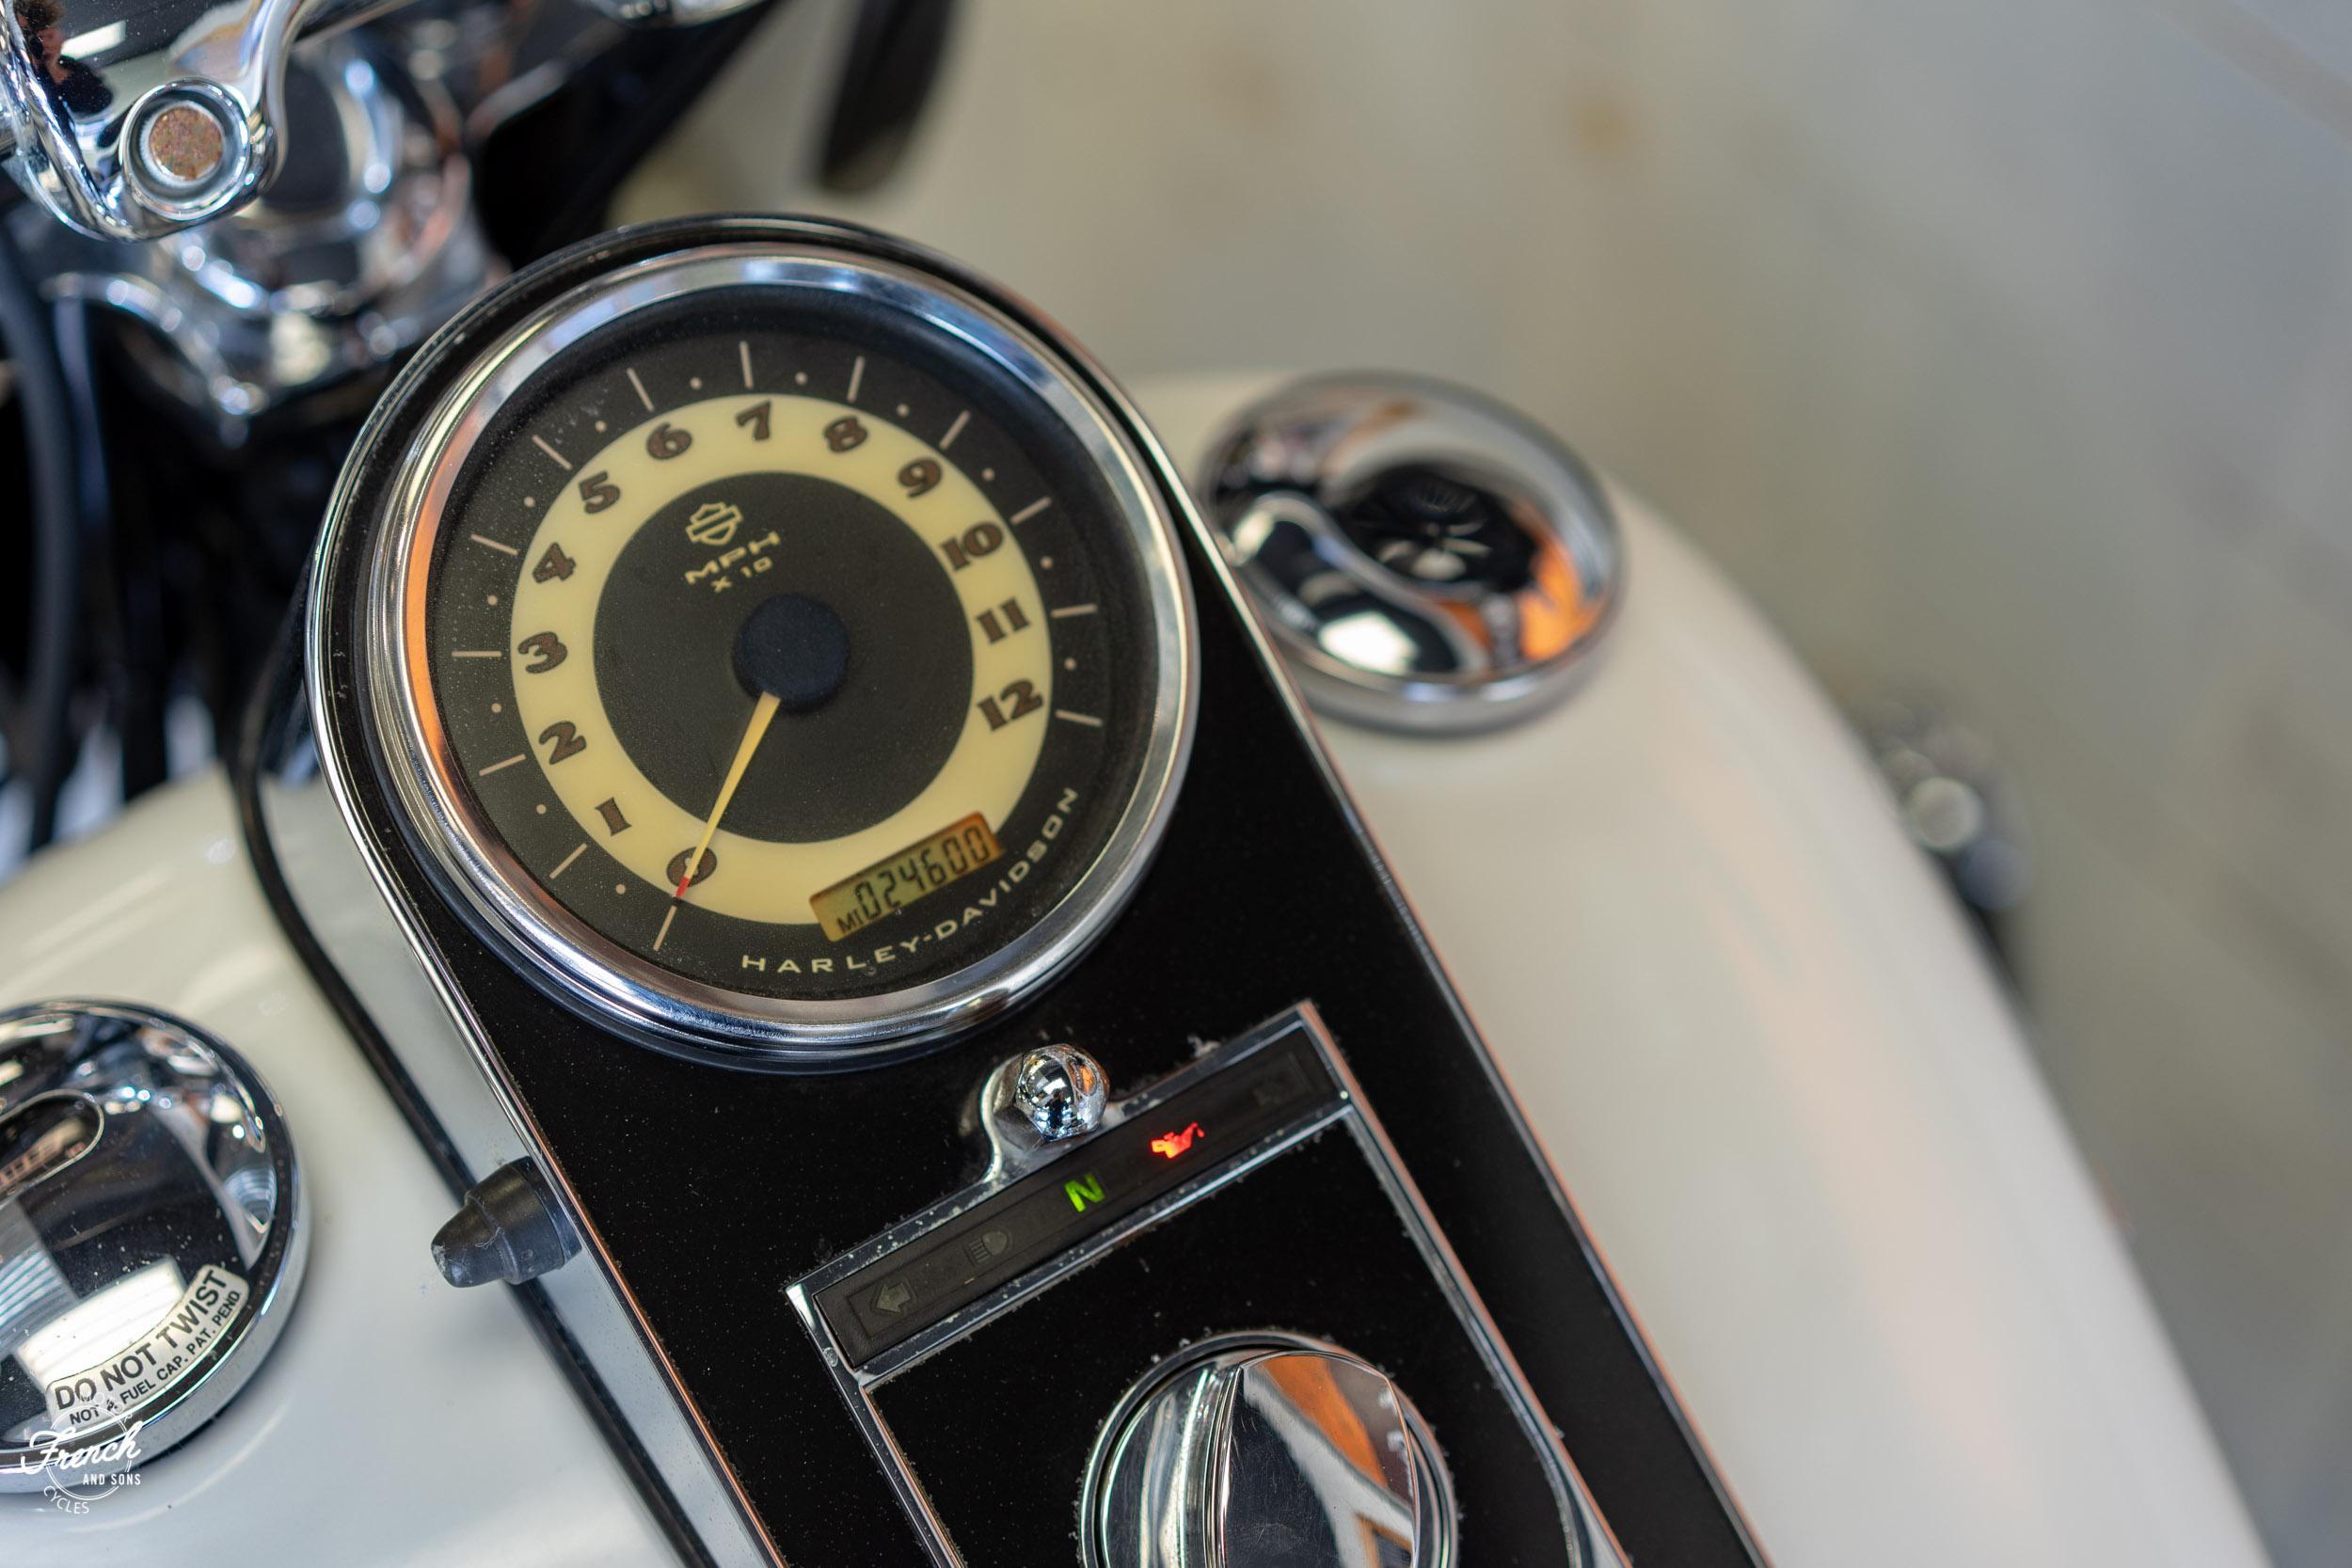 2005_Harley_Davidson_Softail_Deluxe-25.jpg